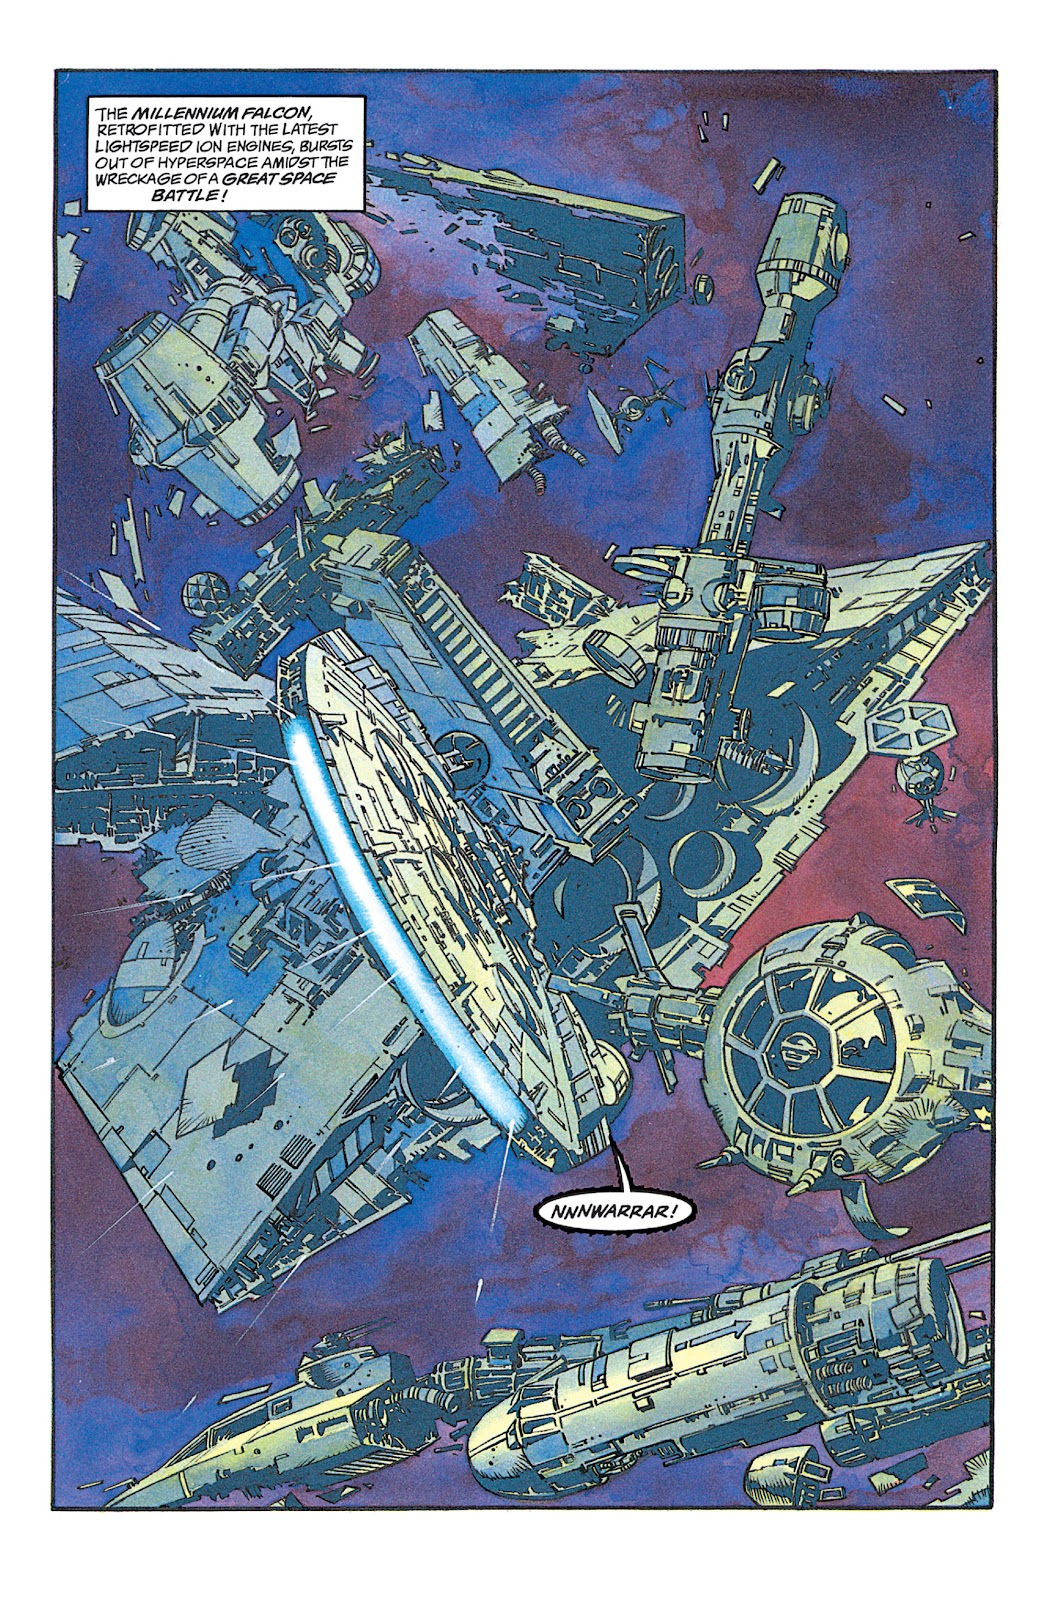 Read online Star Wars: Dark Empire Trilogy comic -  Issue # TPB (Part 1) - 8